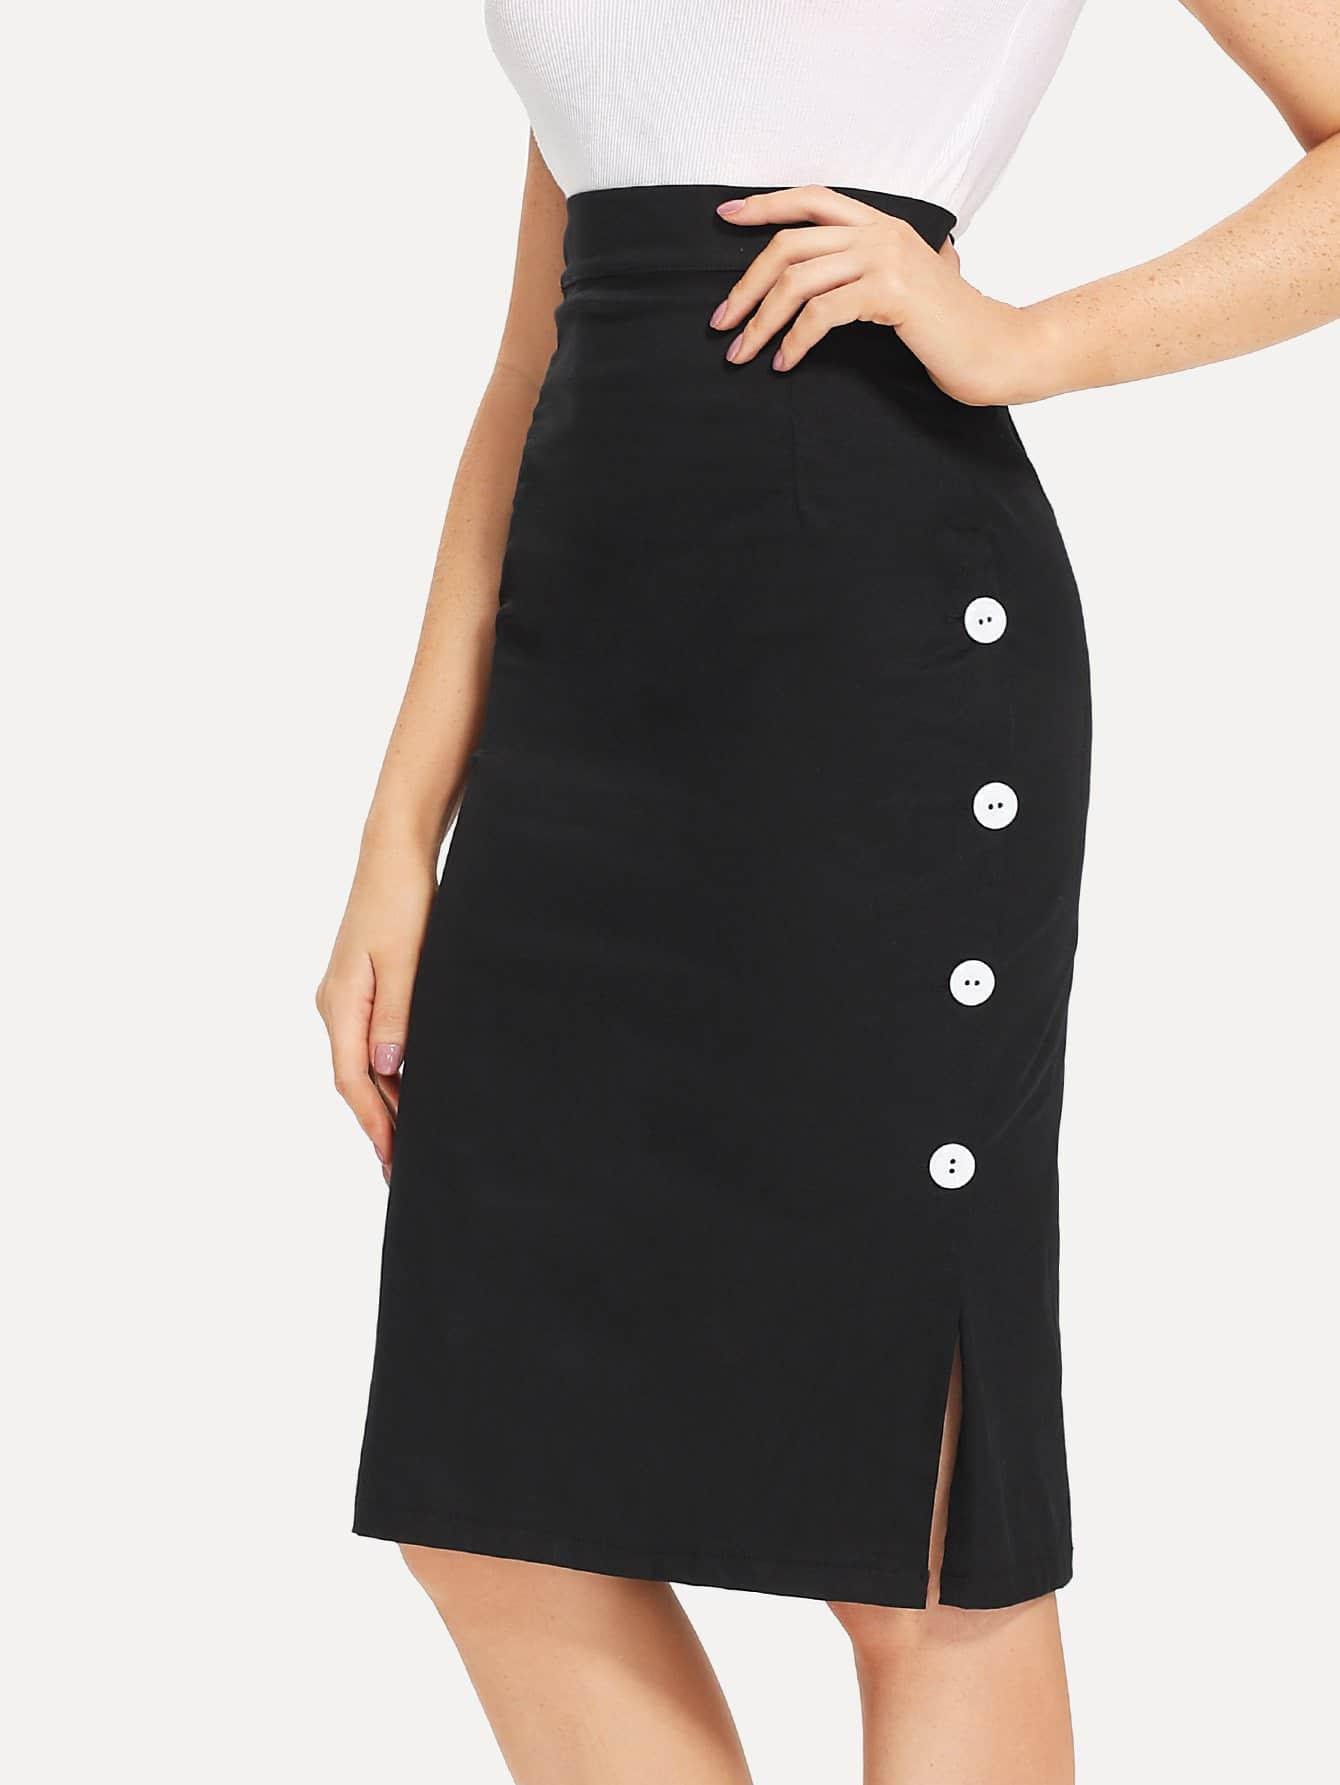 Single Breasted Side Skirt